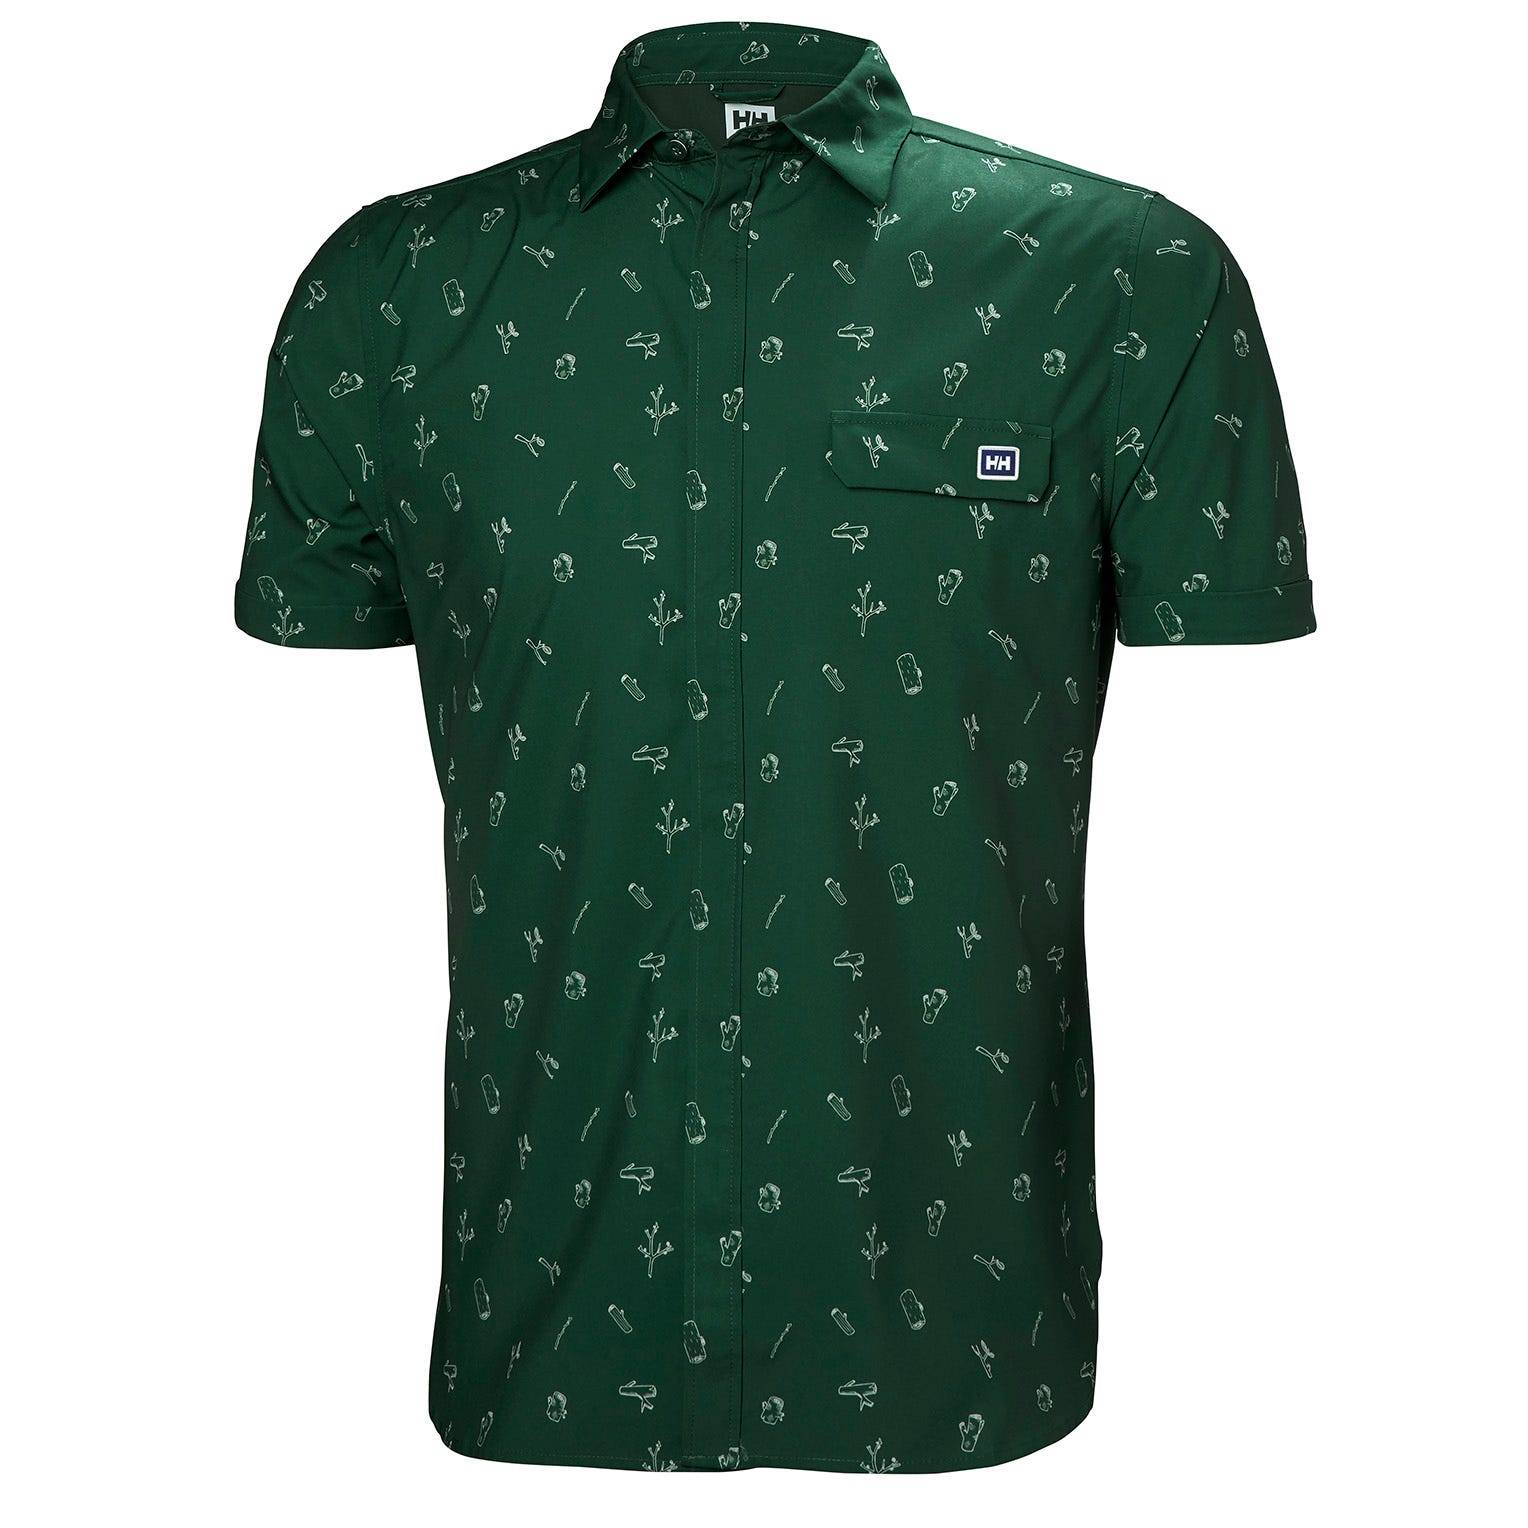 Helly Hansen Oya Shirt Mens Midlayer Green S